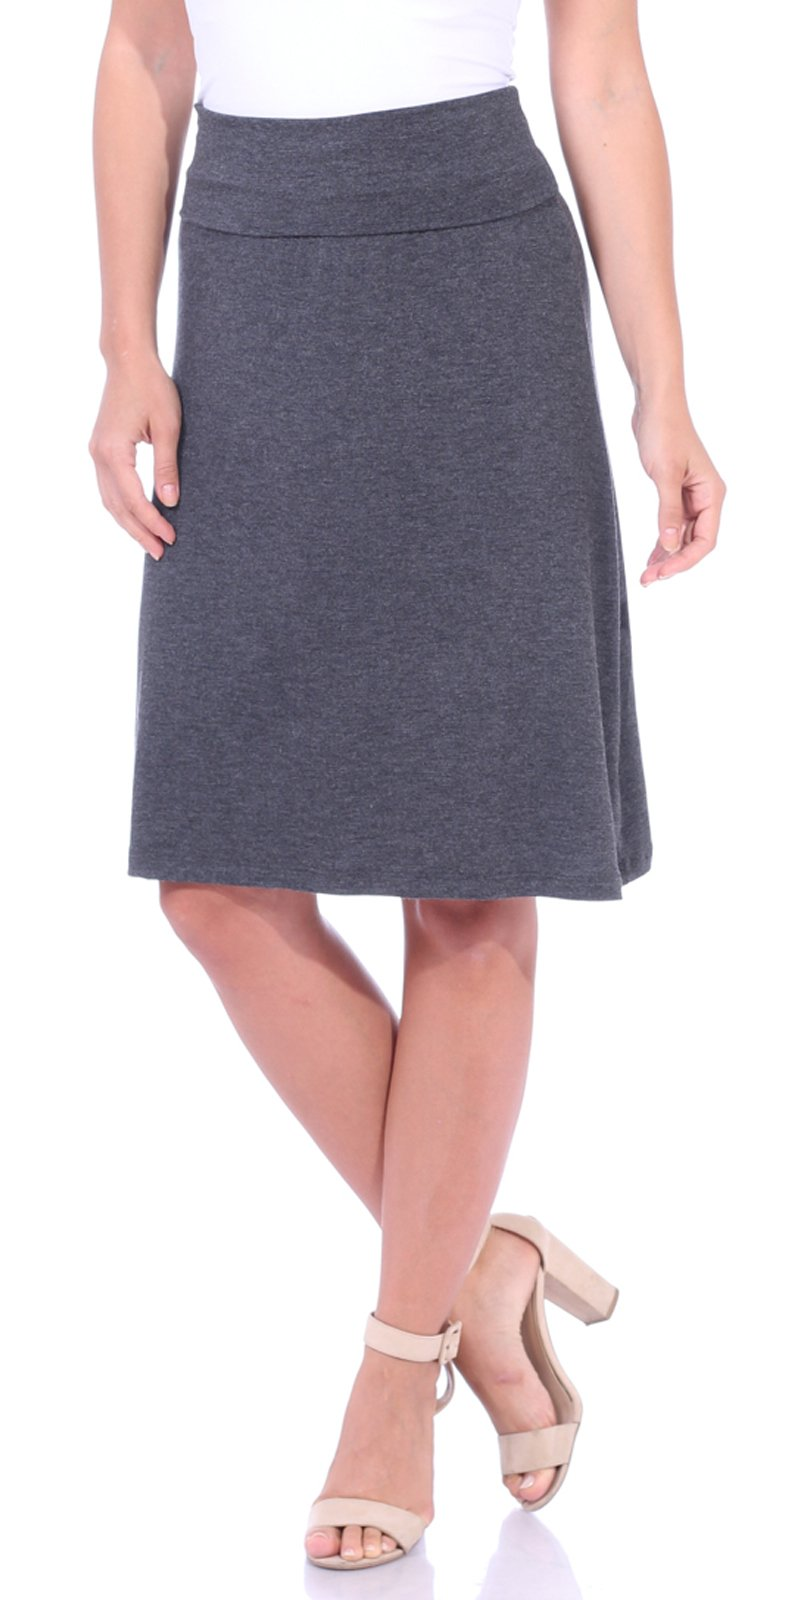 Popana Women's Casual Stretch Midi Knee Length Short Summer Skirt - Made in USA Medium Charcoal